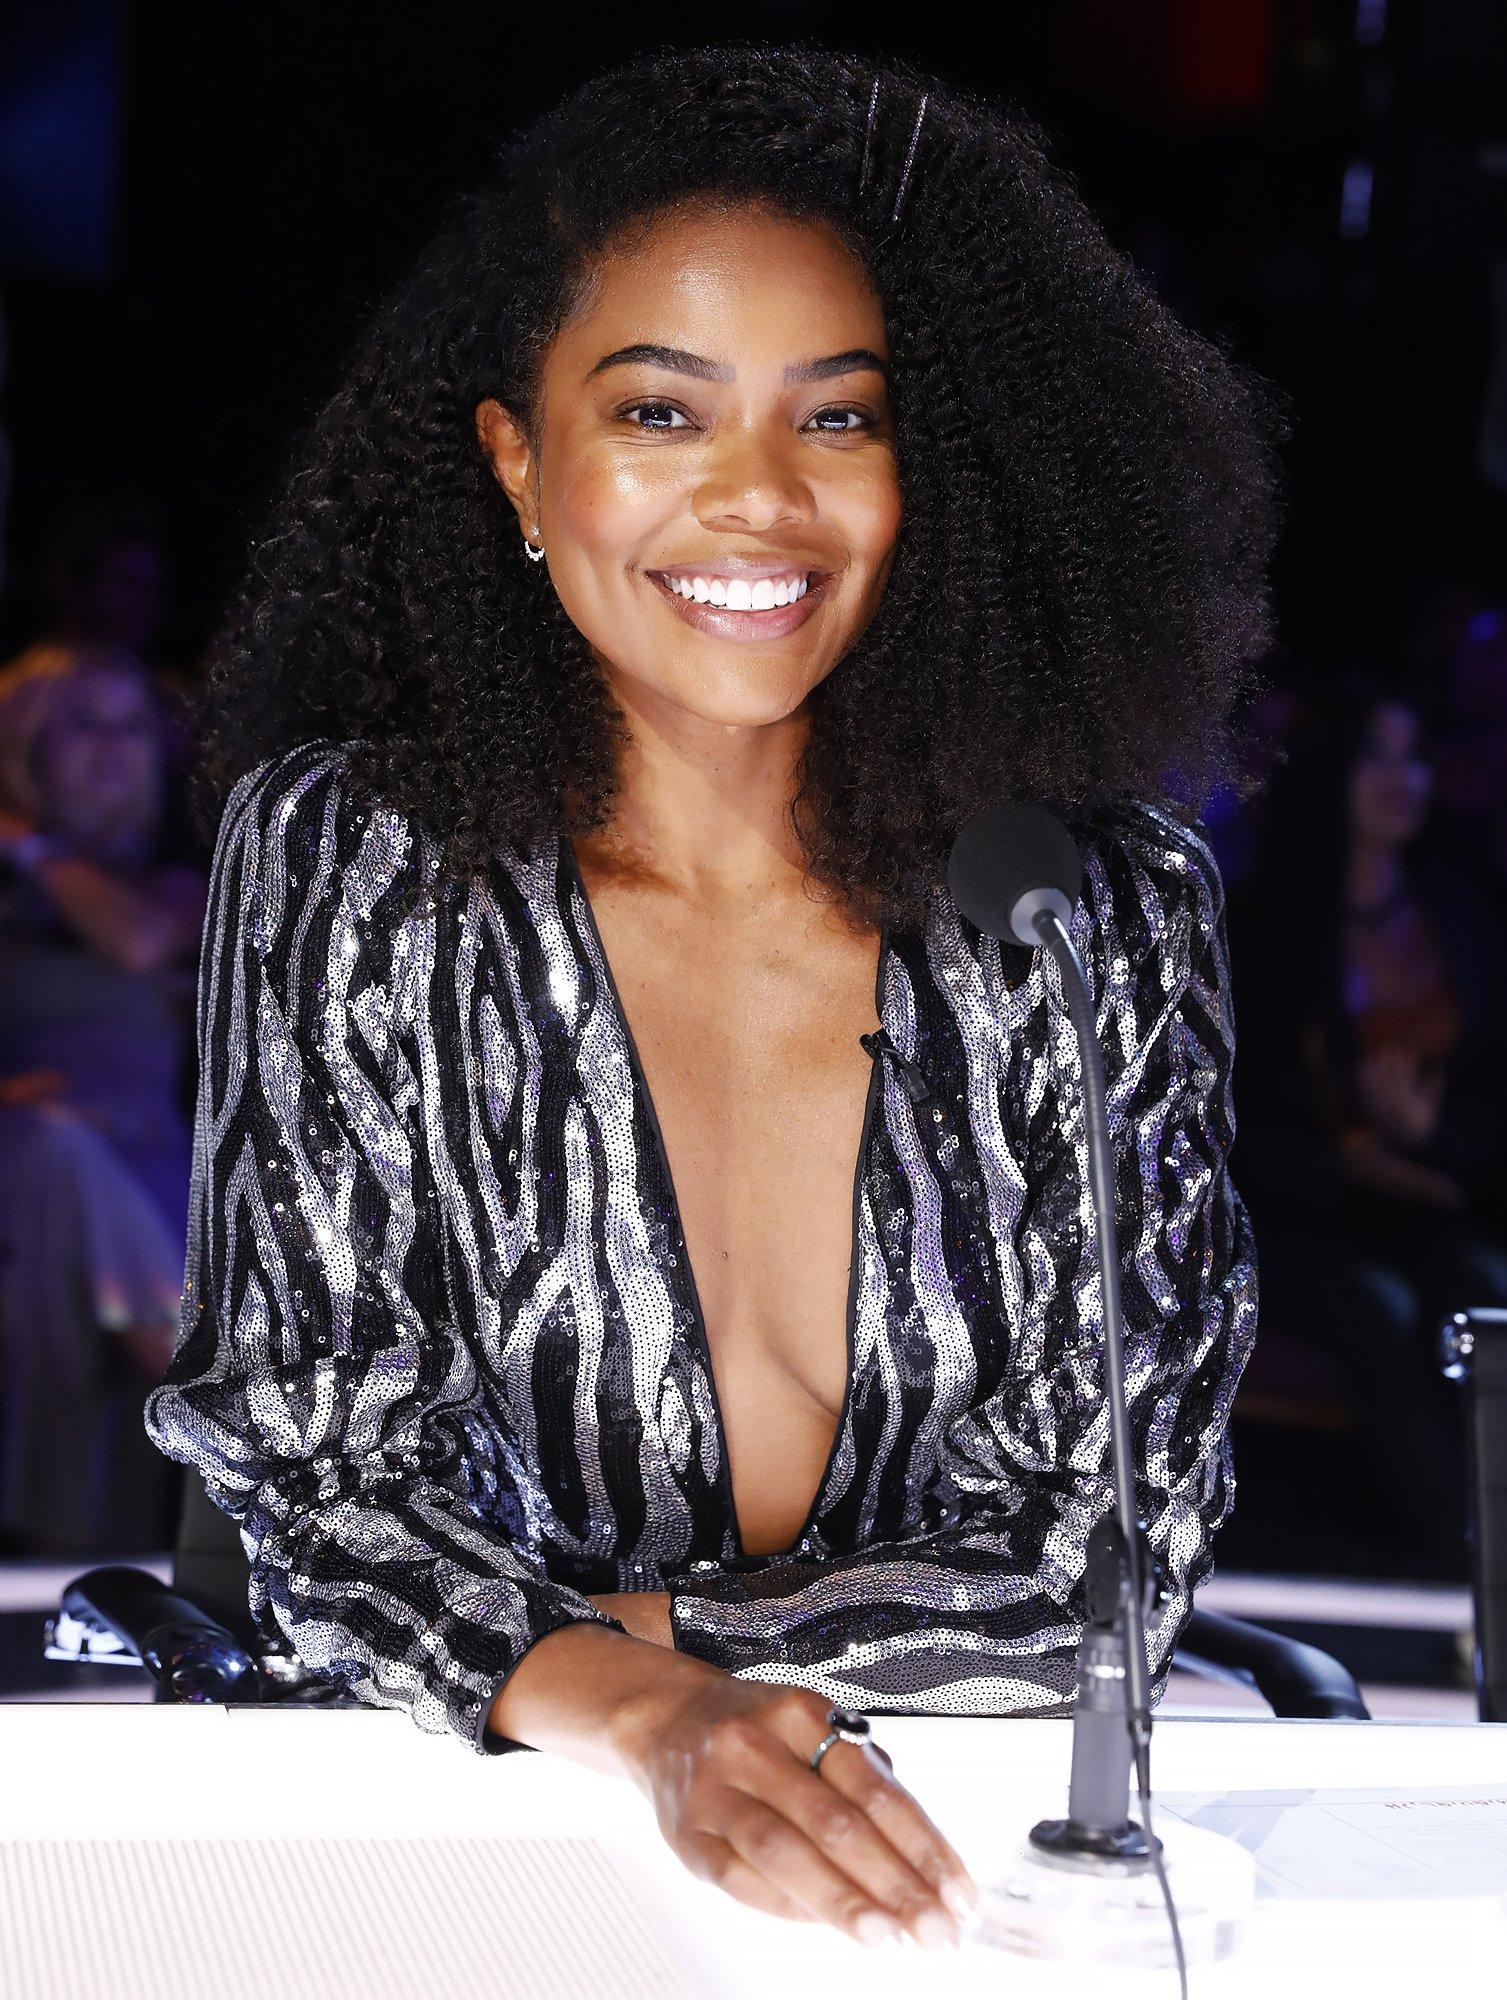 Gabrielle Union Americas Got Talent hairstyles too black